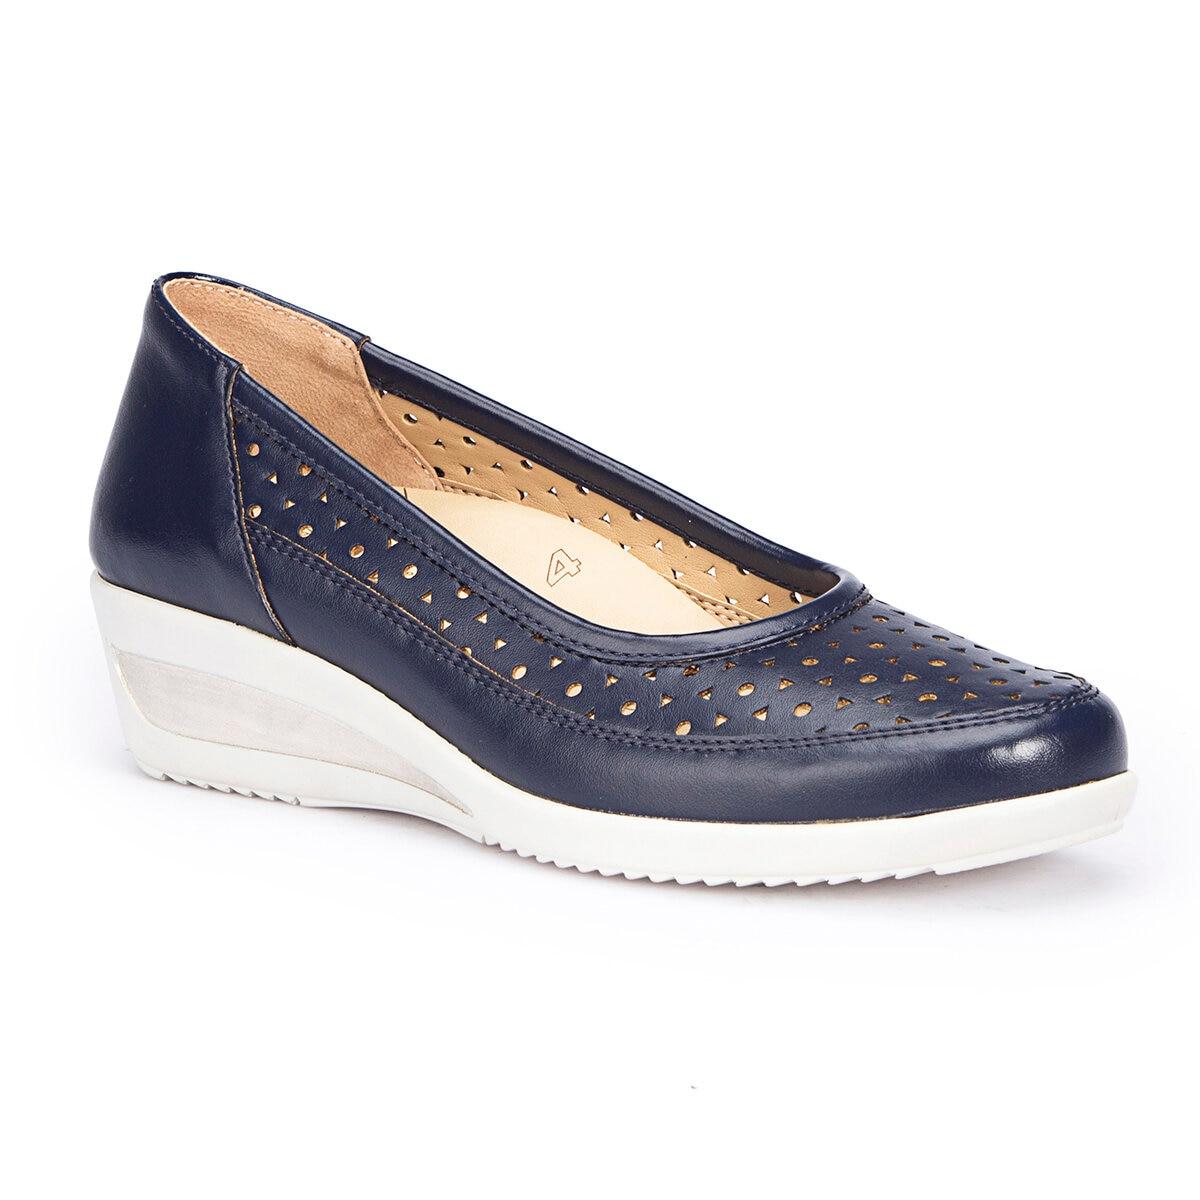 FLO 71.109622.Z Navy Blue Women 'S Wedges Shoes Polaris 5 Point